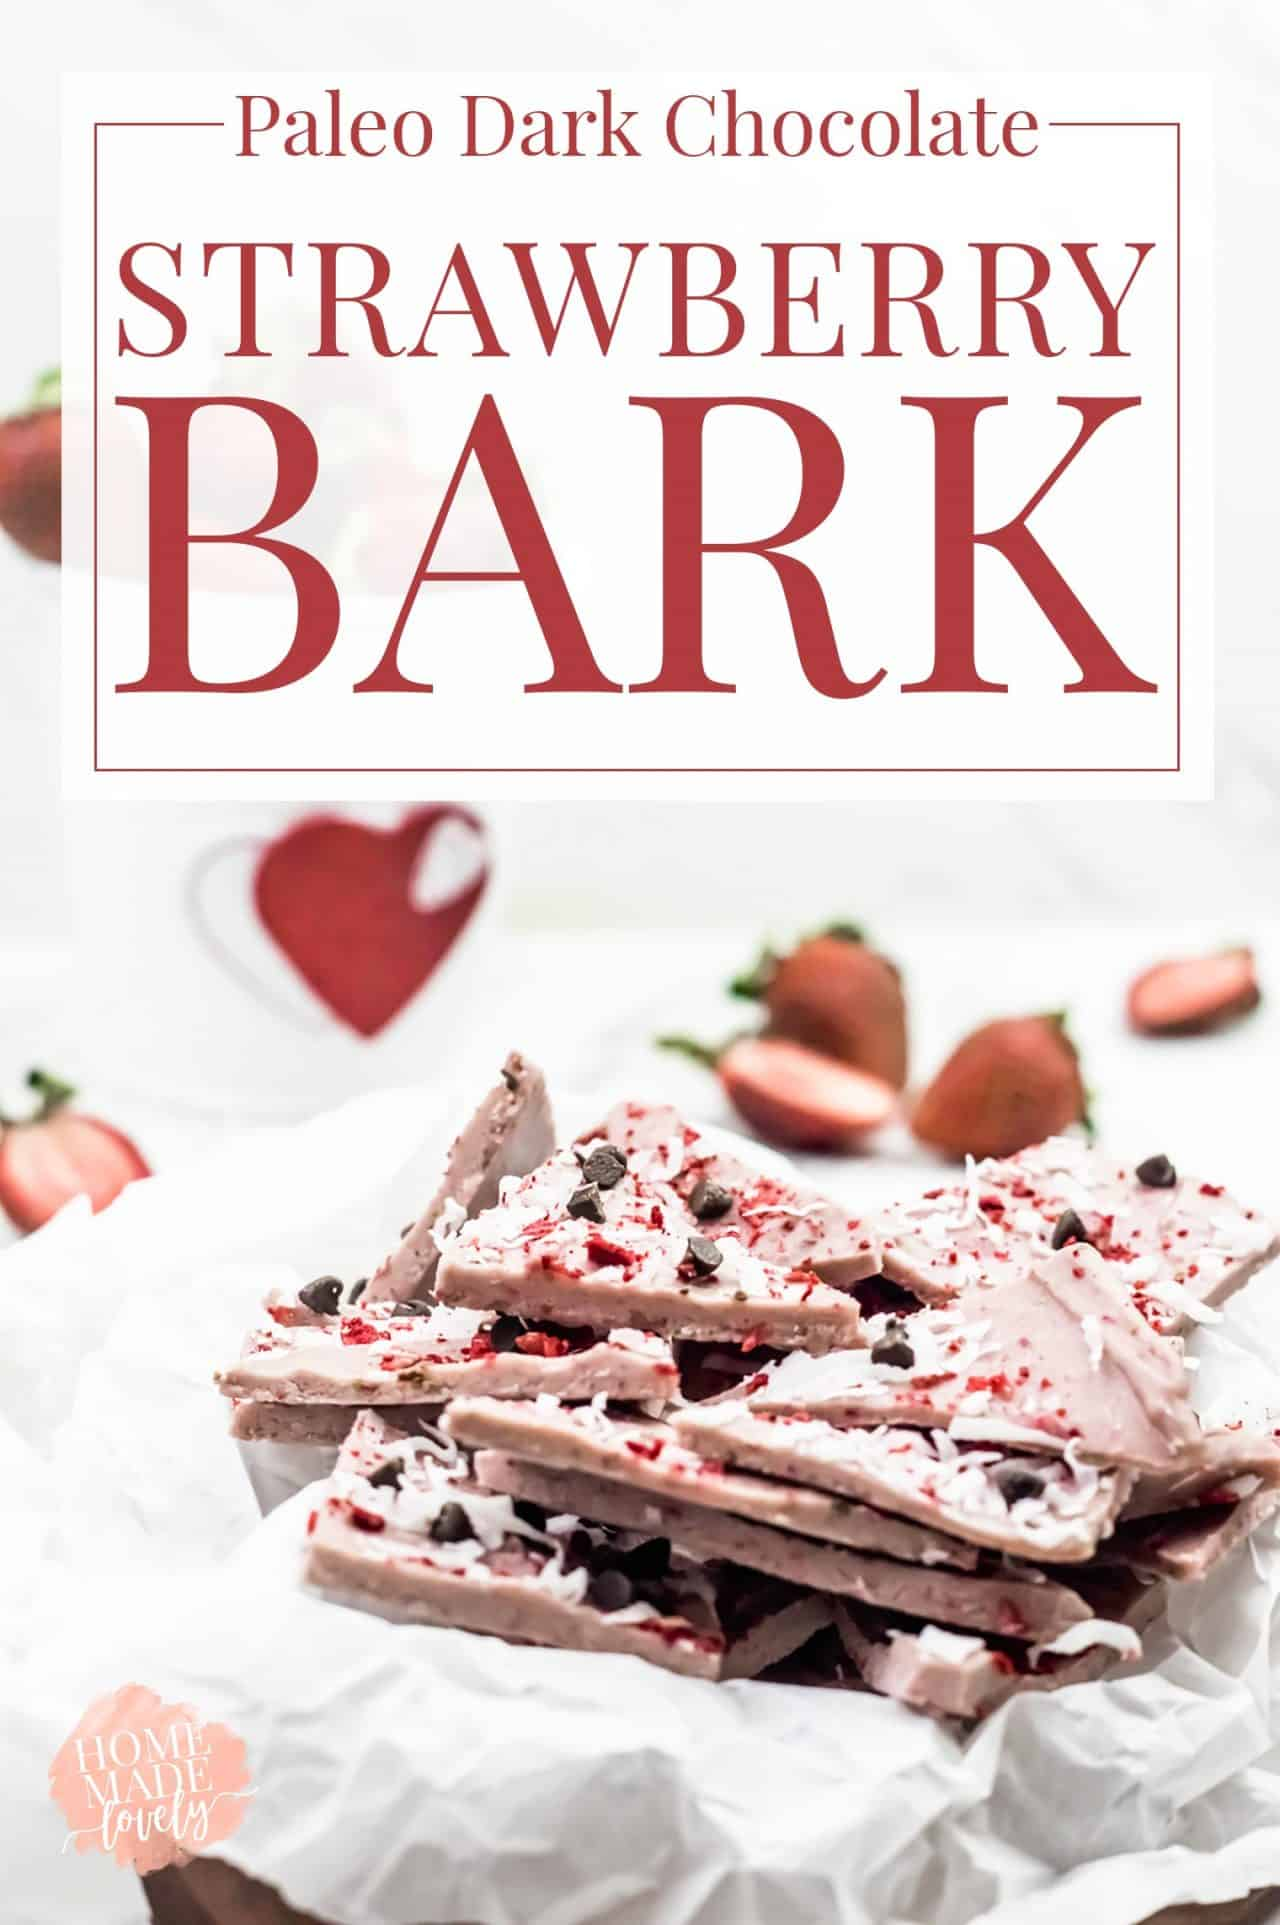 paleo dark chocolate strawberry bark stacked on a white paper dish